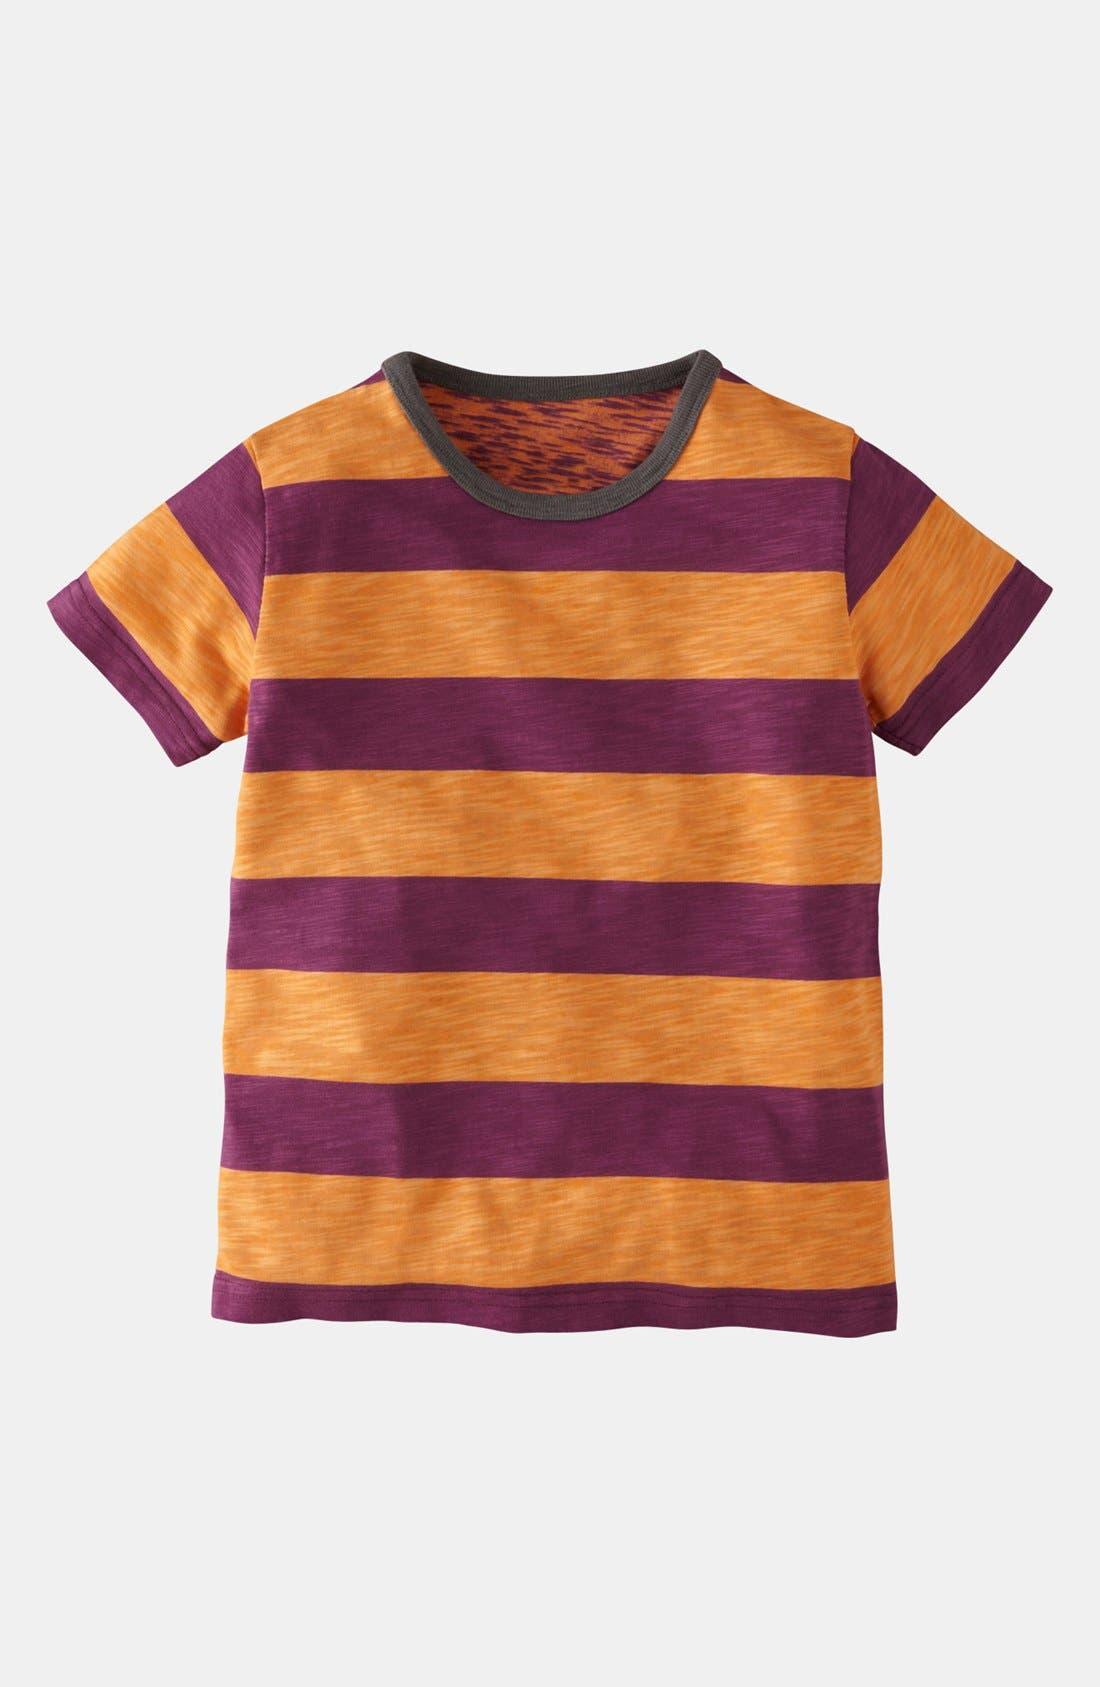 Alternate Image 1 Selected - Mini Boden 'Stripy' T-Shirt (Little Boys & Big Boys)